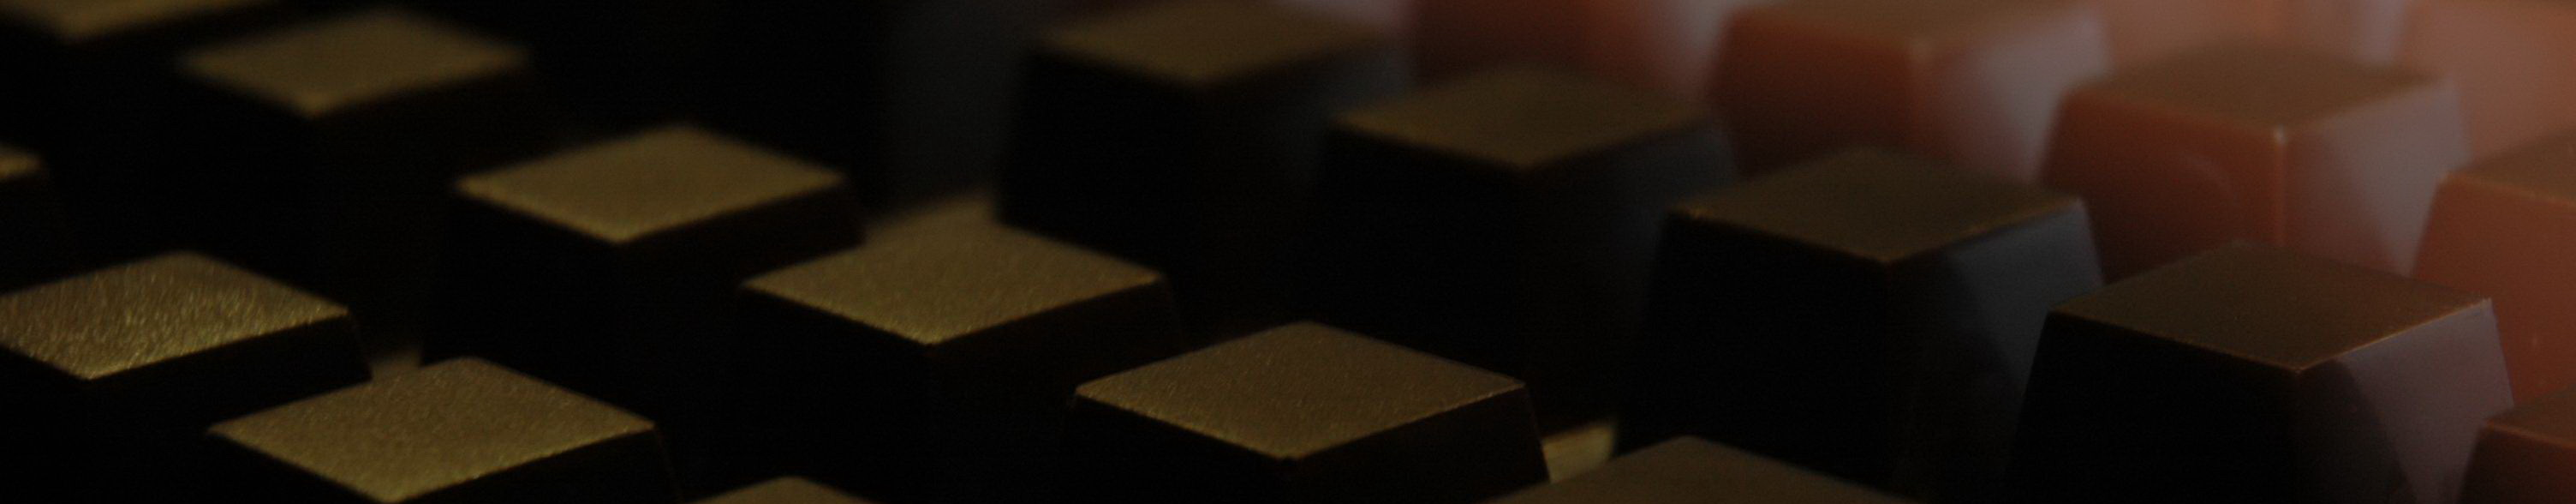 Dark-chocolate-slider